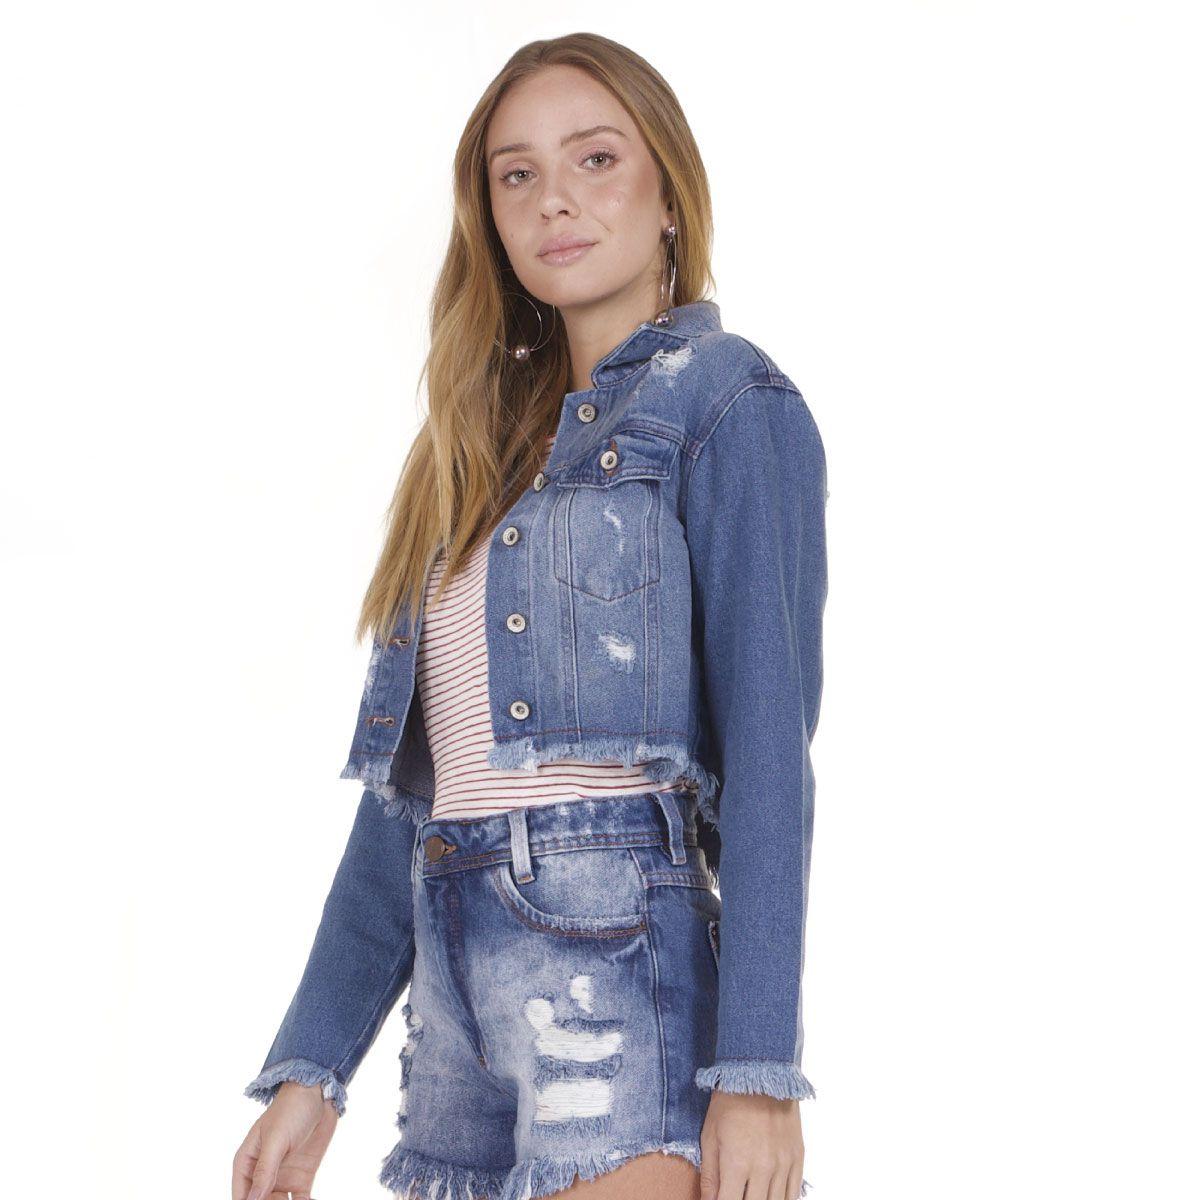 Jaqueta Jeans Areazul Cropped Feminina